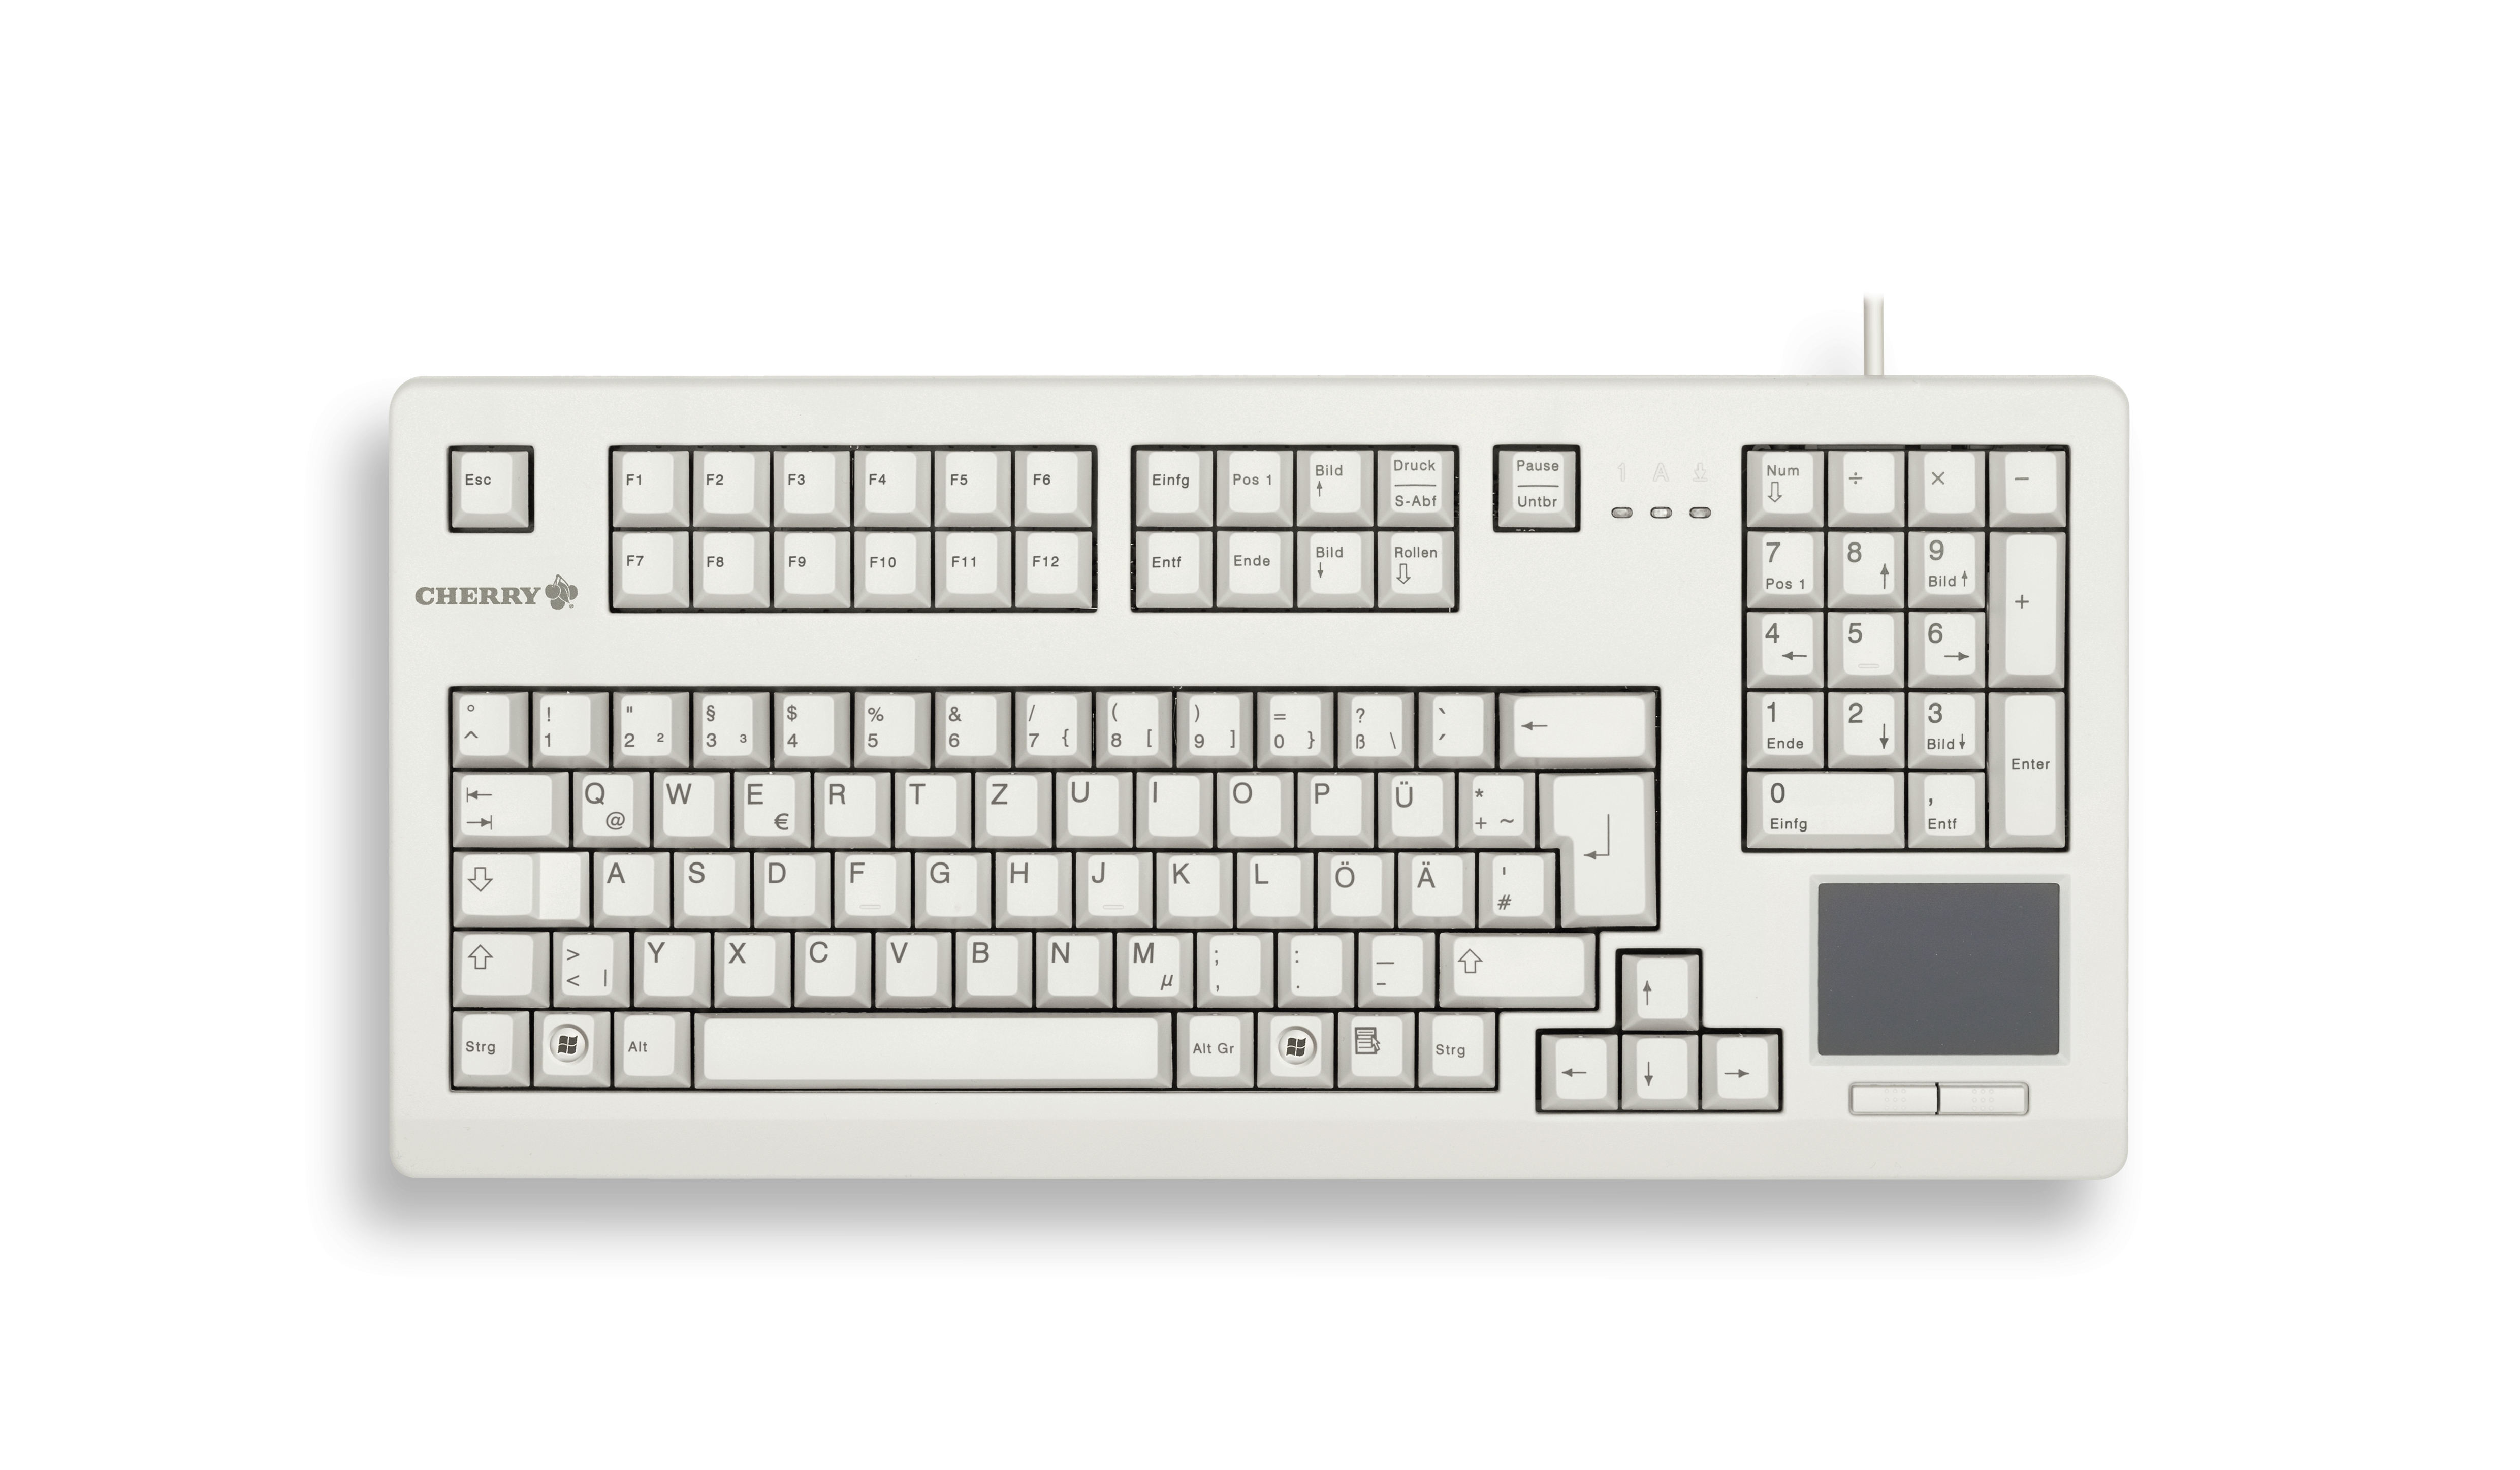 Cherry Advanced Performance Line TouchBoard G80-11900 - Tastatur - 1.000 dpi - 105 Tasten QWERTZ - Grau